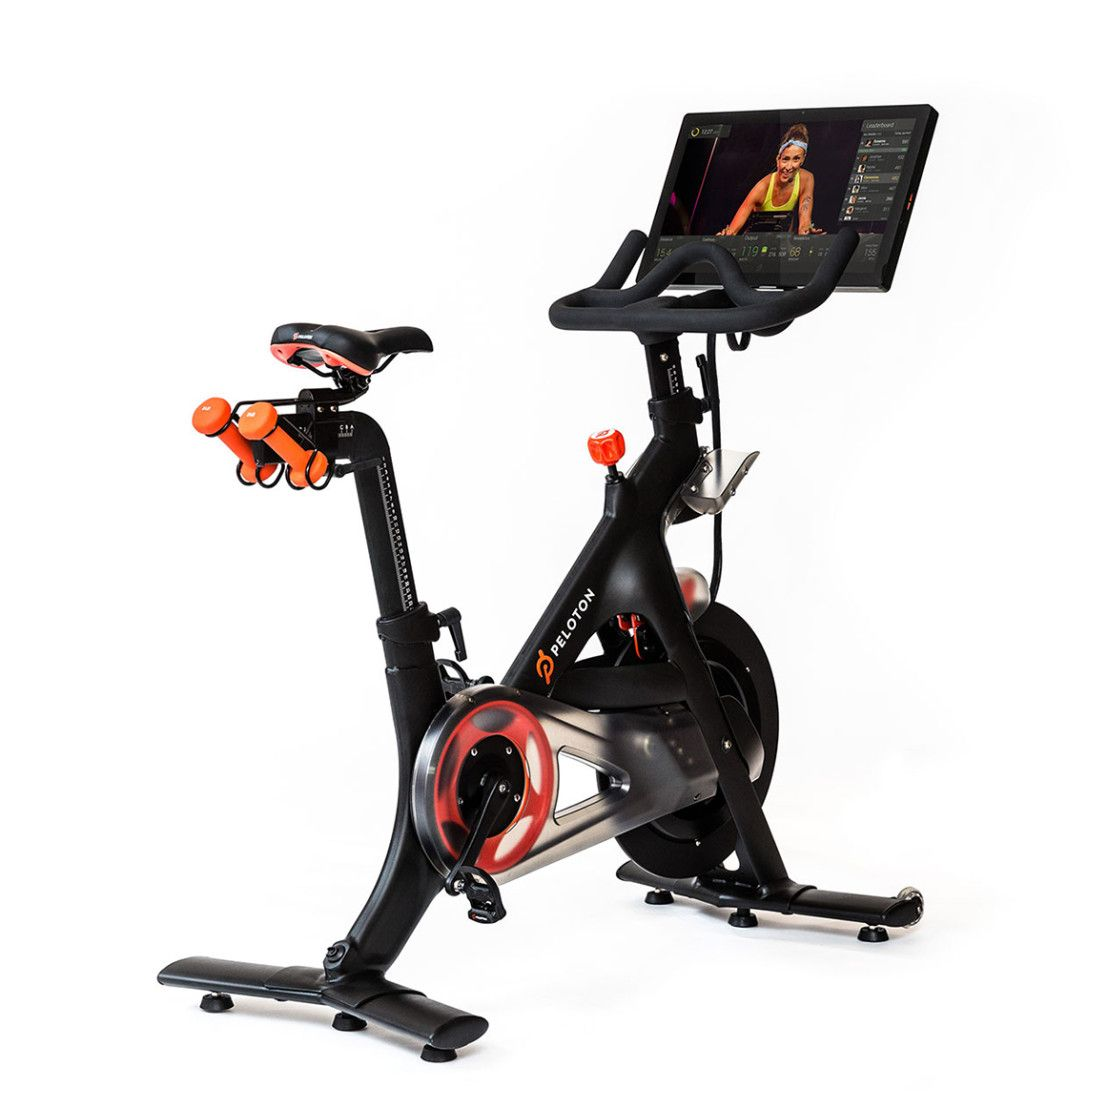 Peloton Buy The Peloton Bike Biking Workout Indoor Bike Workouts Peloton Bike